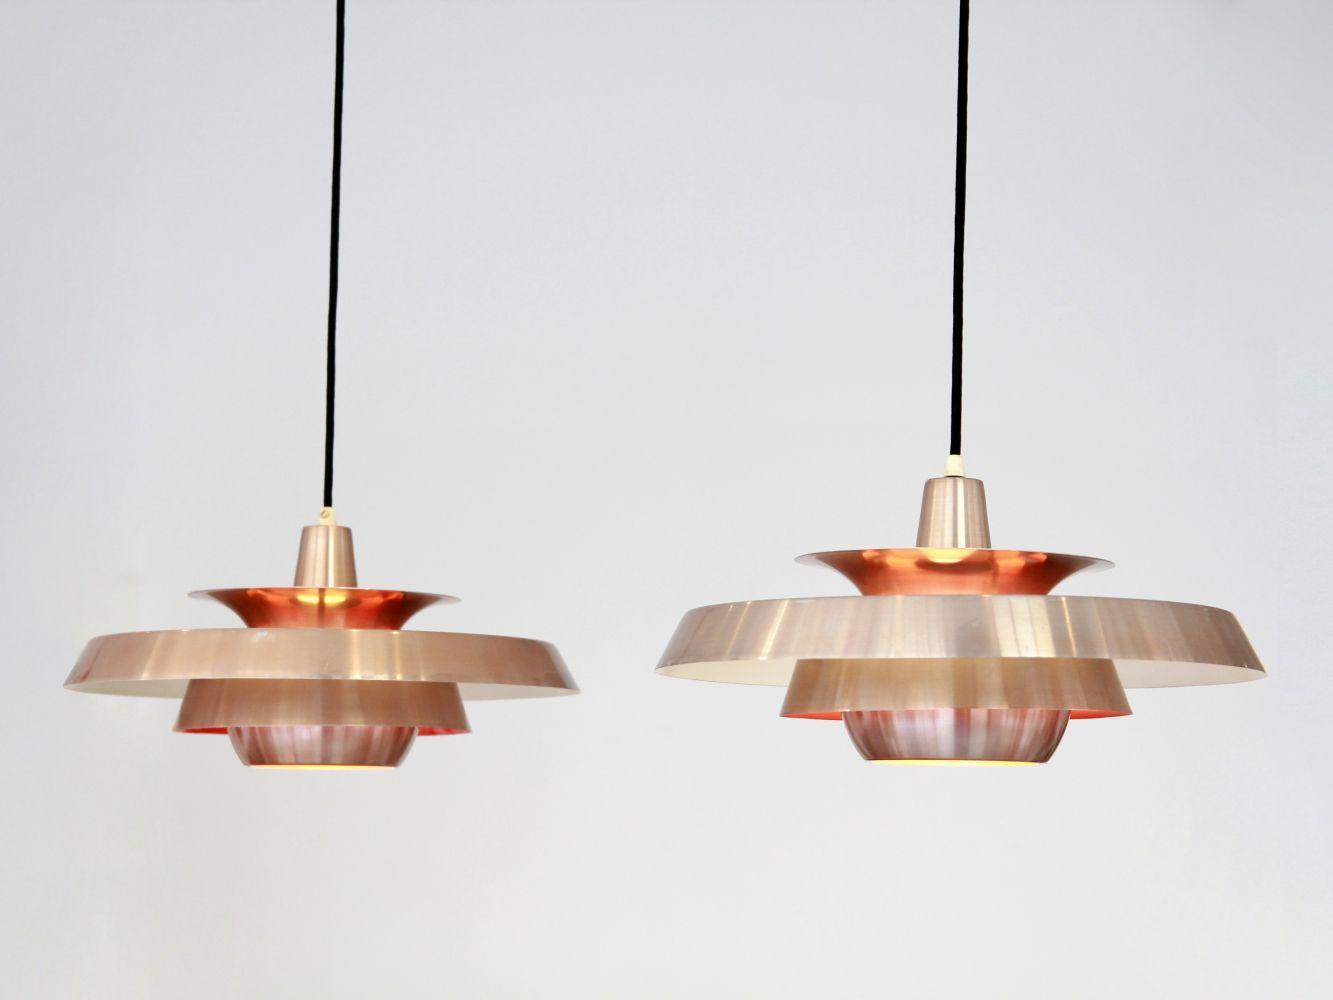 For Sale Set Of 2 Copper Danish Design Lamps Lamp Design